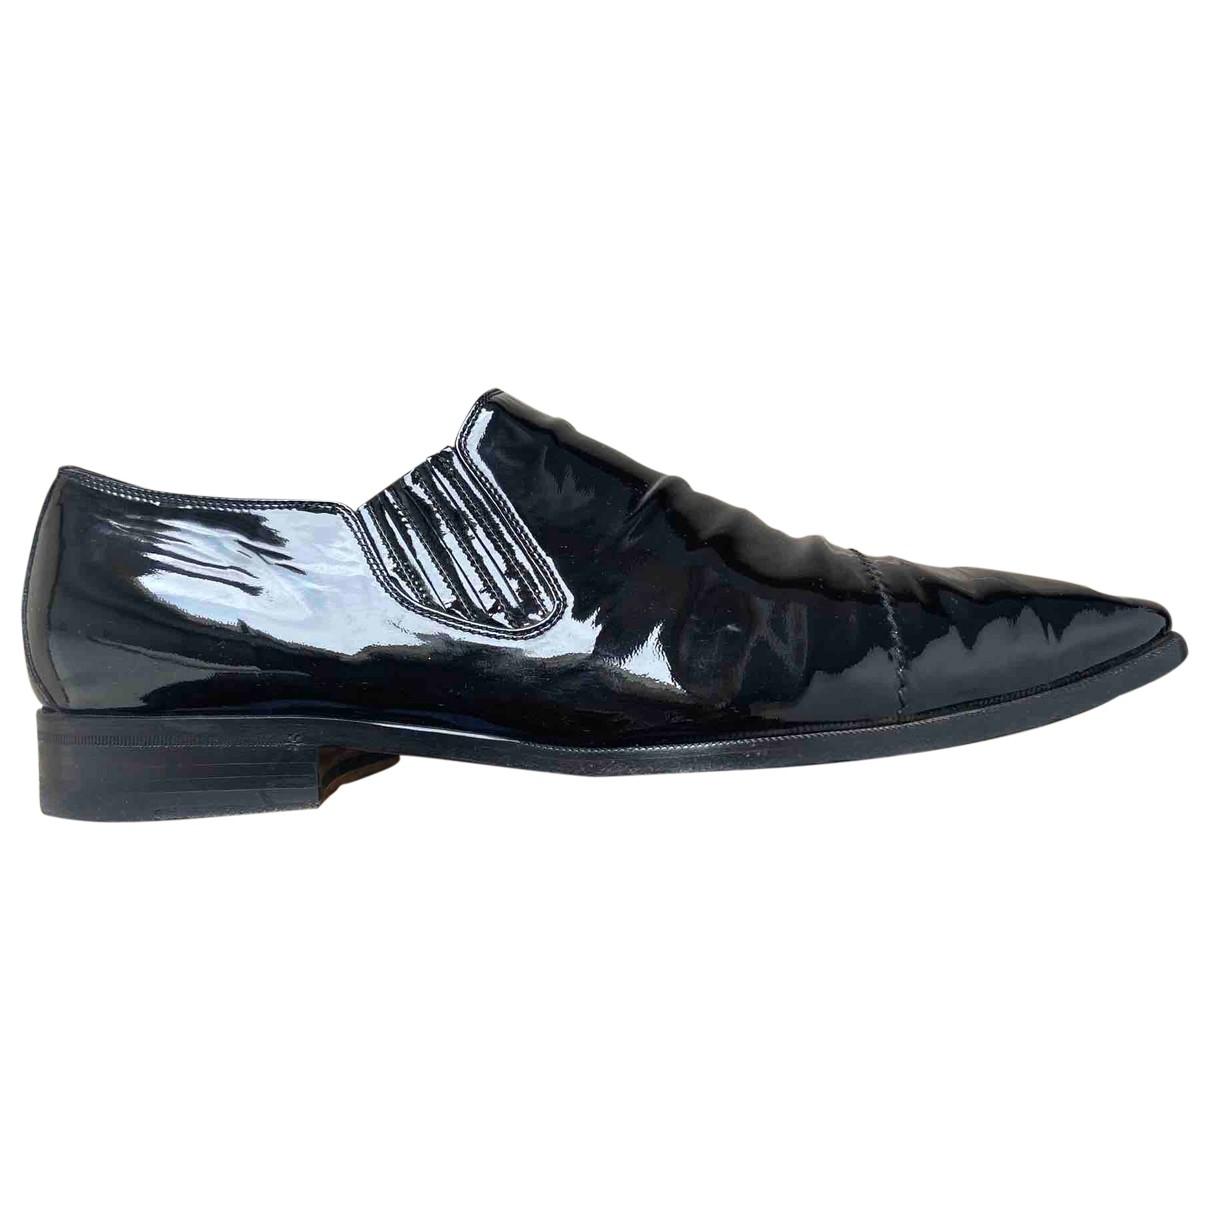 Gucci \N Black Patent leather Flats for Men 43.5 EU